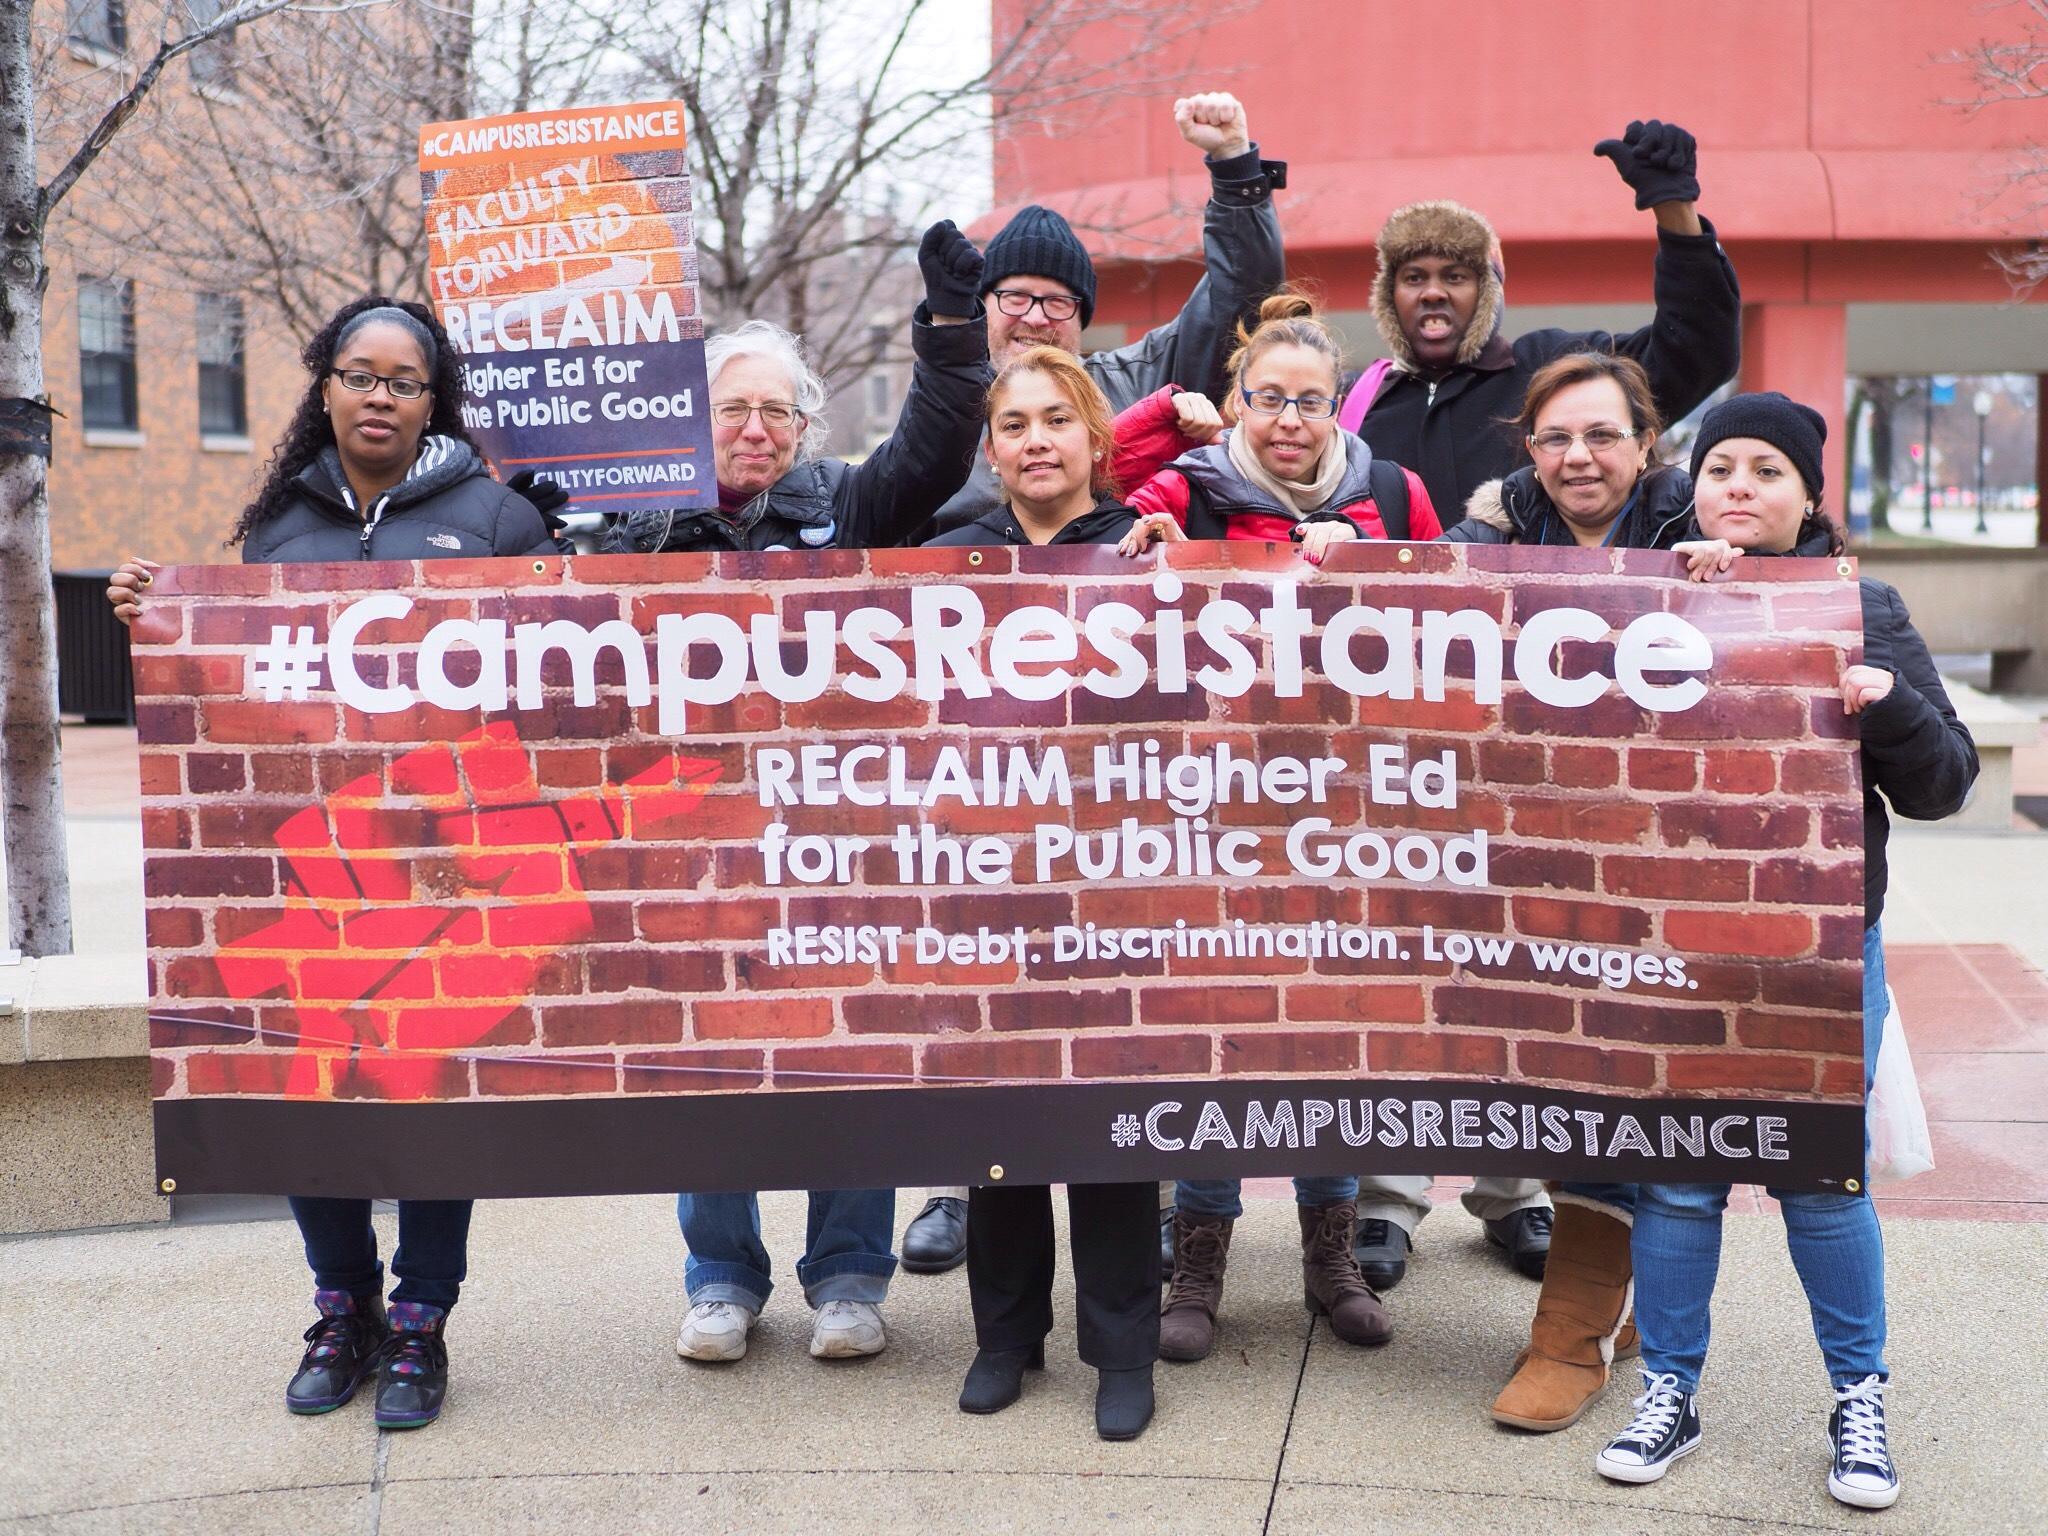 Campus Resistance